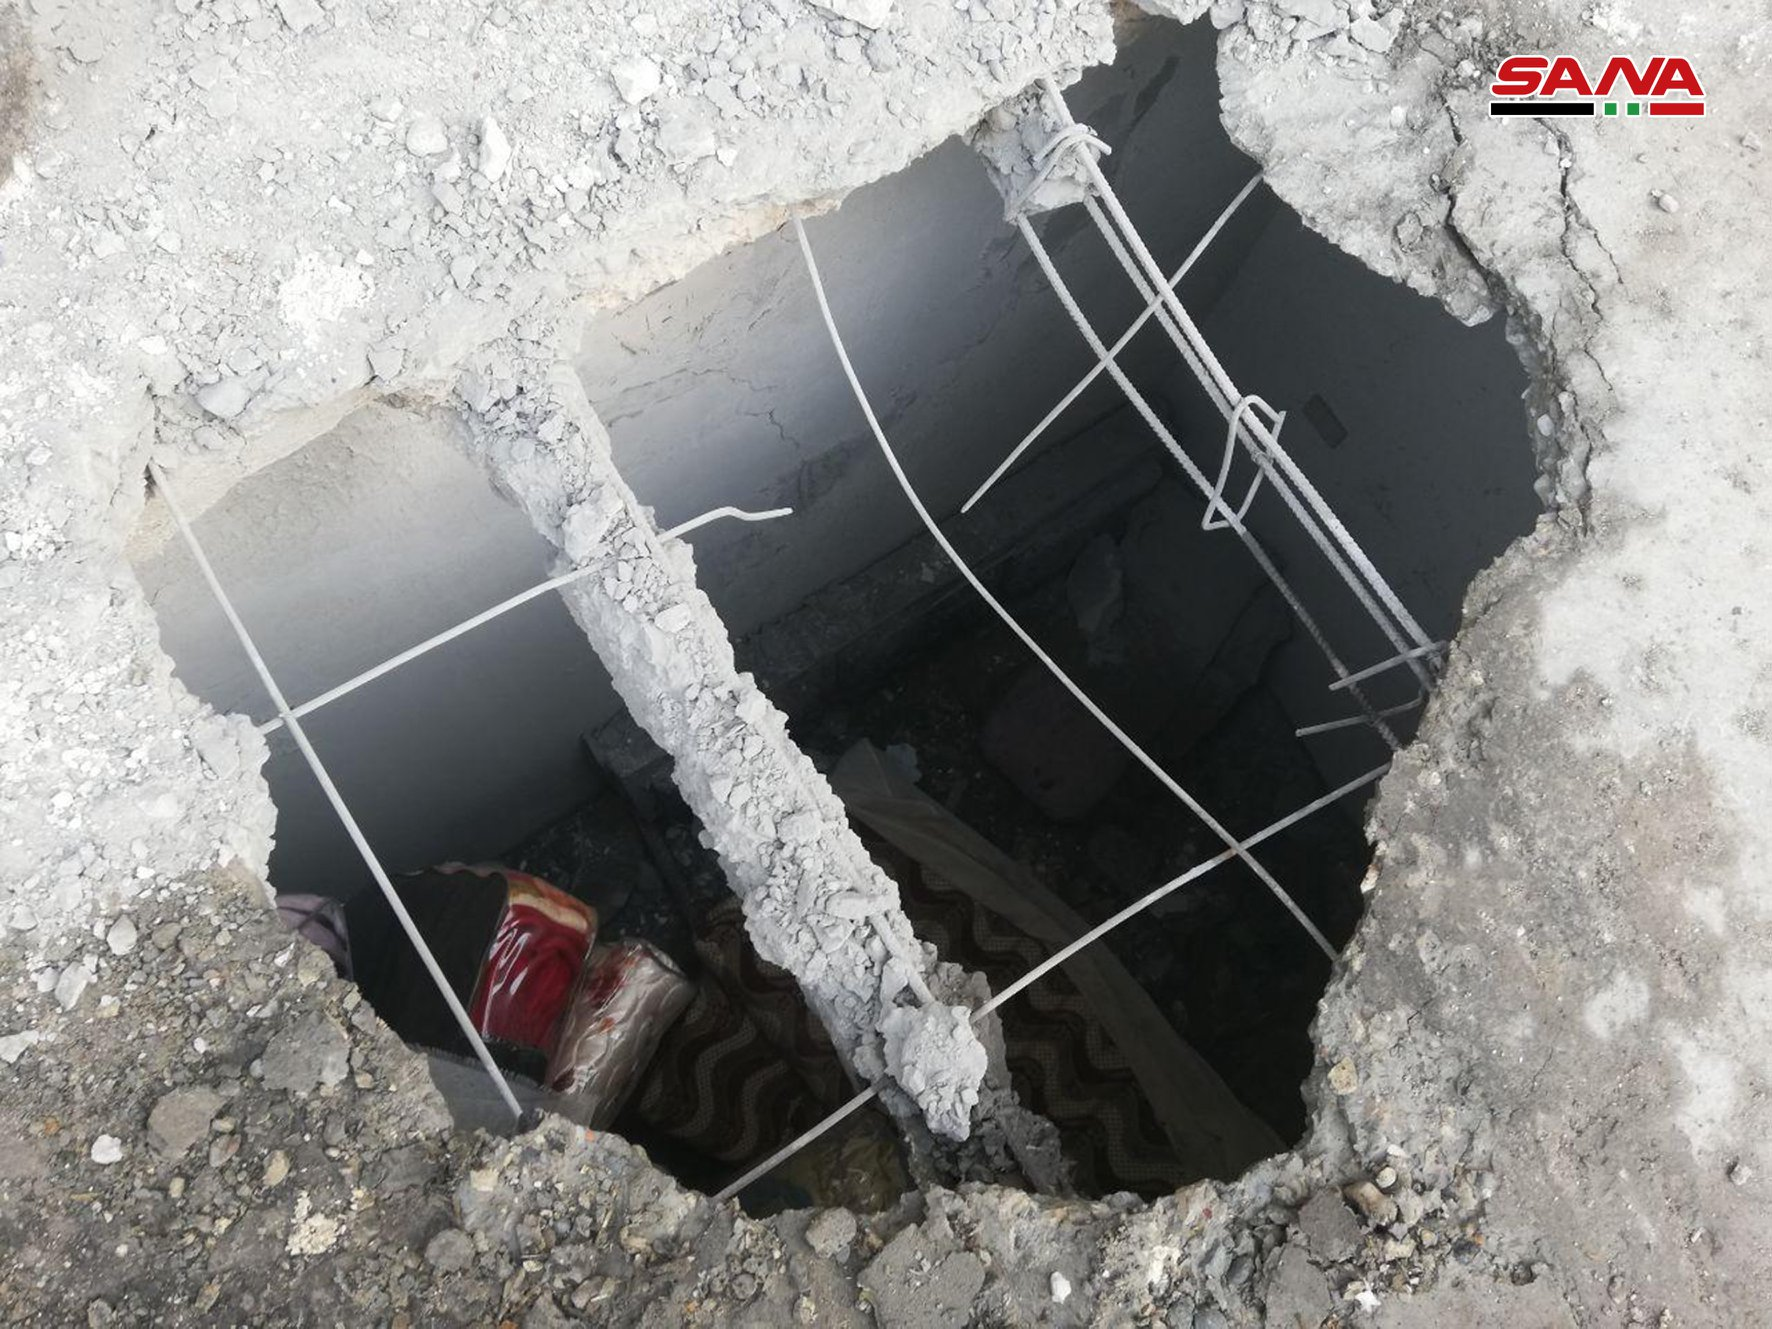 Terrorists Launch Rocket At Lattakia City Injuring Several Civilians (Photos)